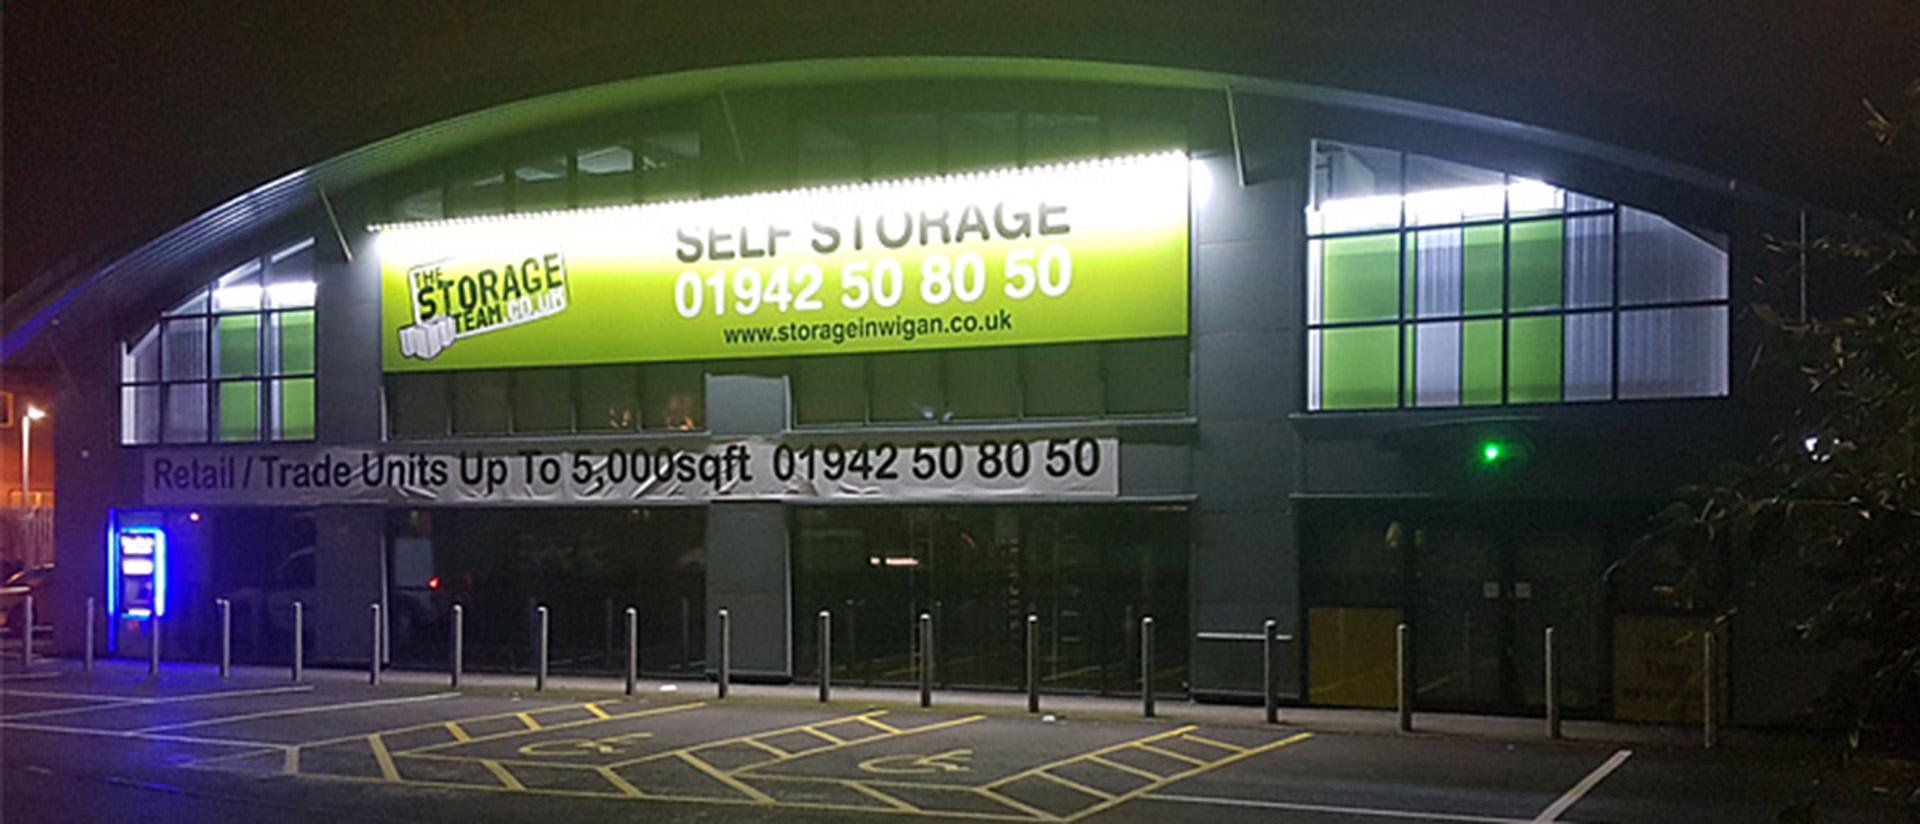 Self storage facility in Wigan